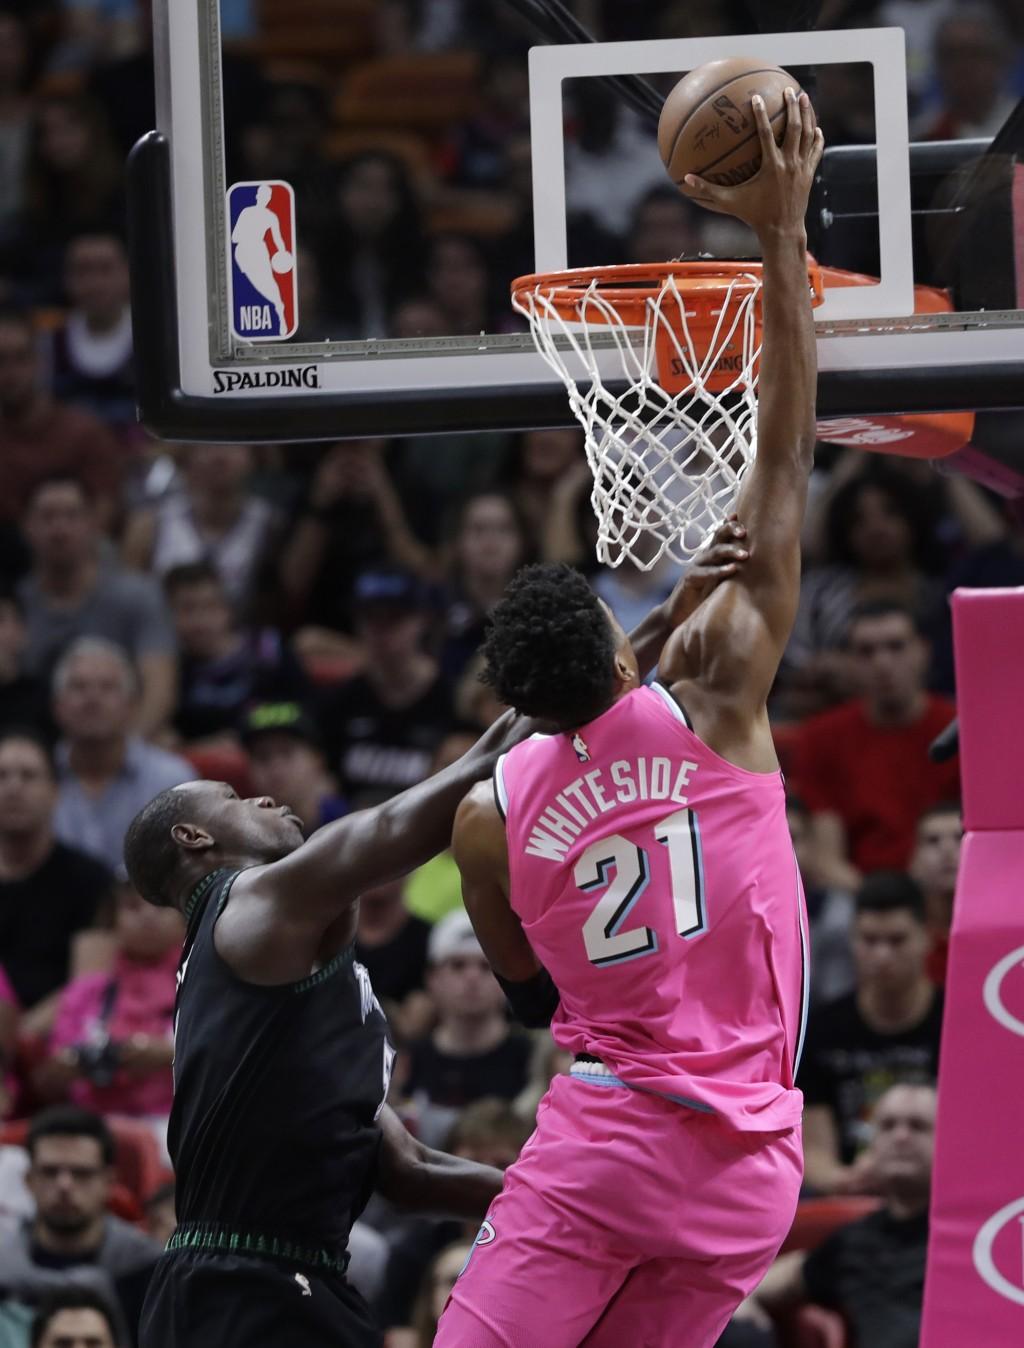 Miami Heat center Hassan Whiteside (21) shoots over Minnesota Timberwolves center Gorgui Dieng during the first half of an NBA basketball game, Sunday...